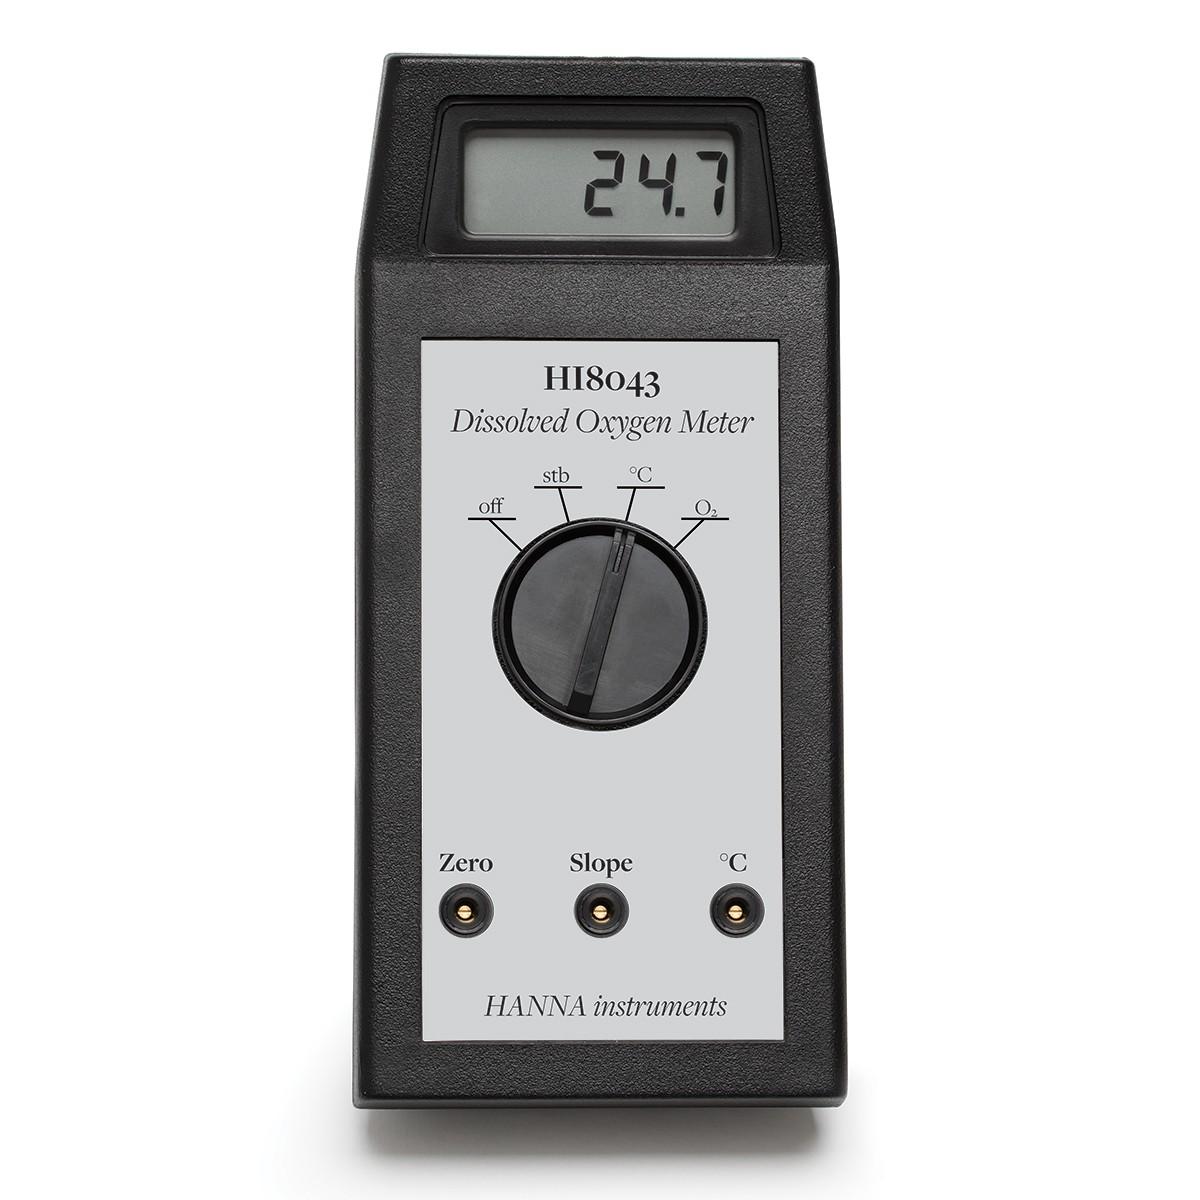 Portable Dissolved Oxygen meter - HI8043